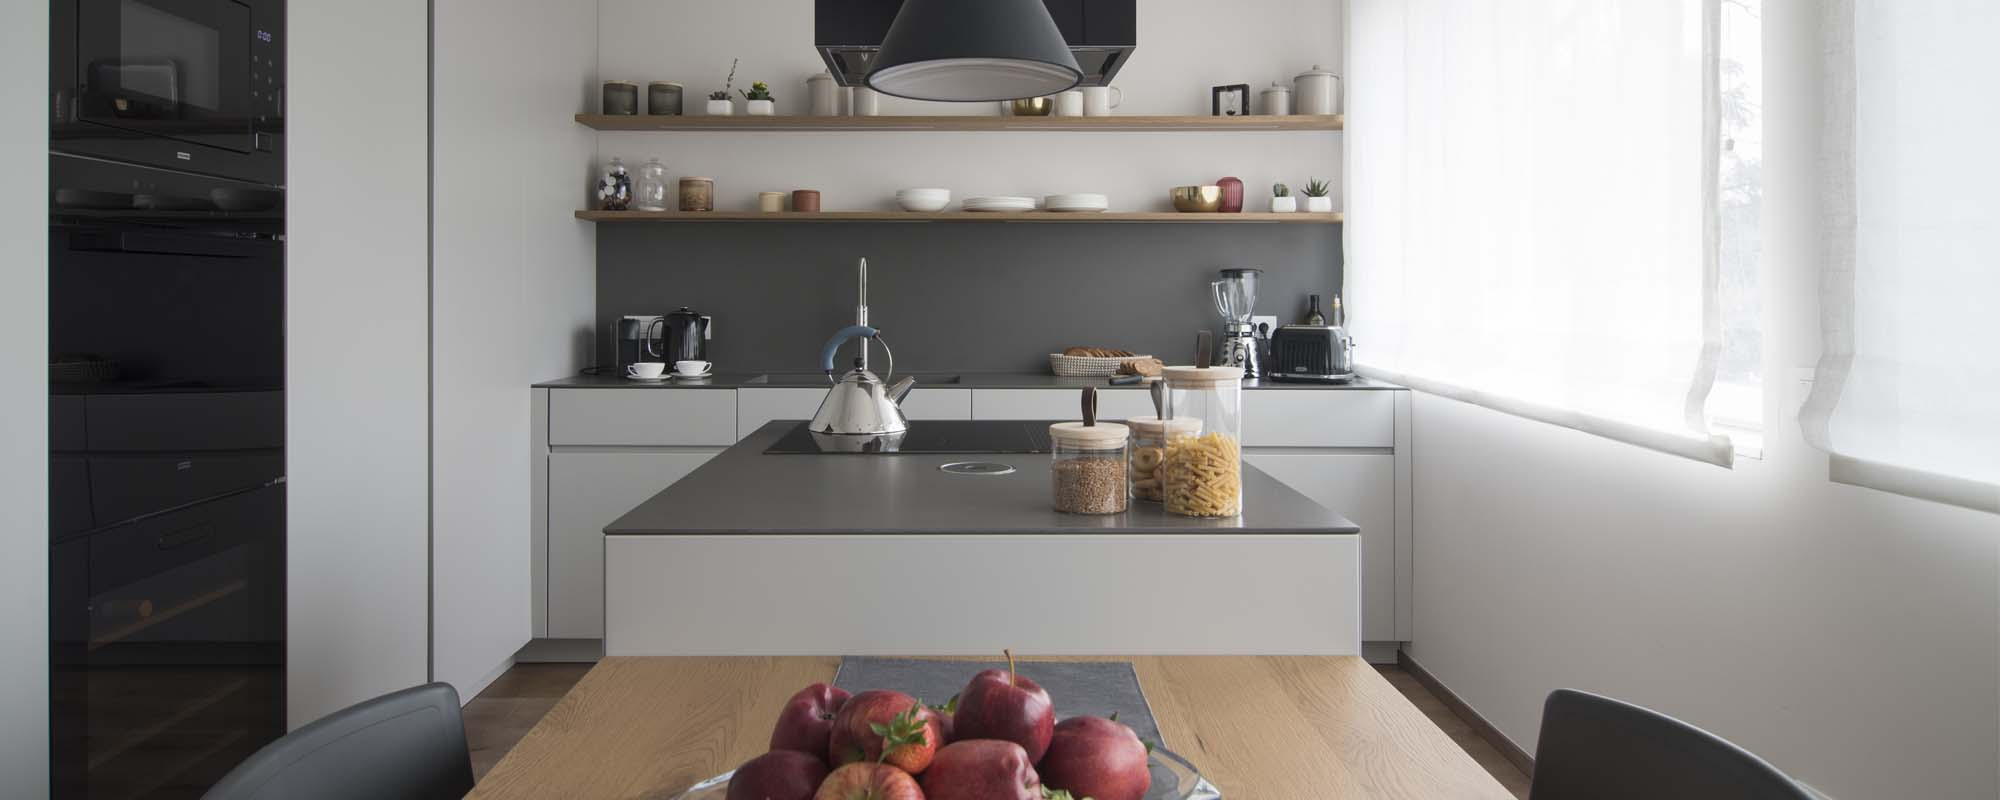 Una cucina per Angela - Andrea Castrignano